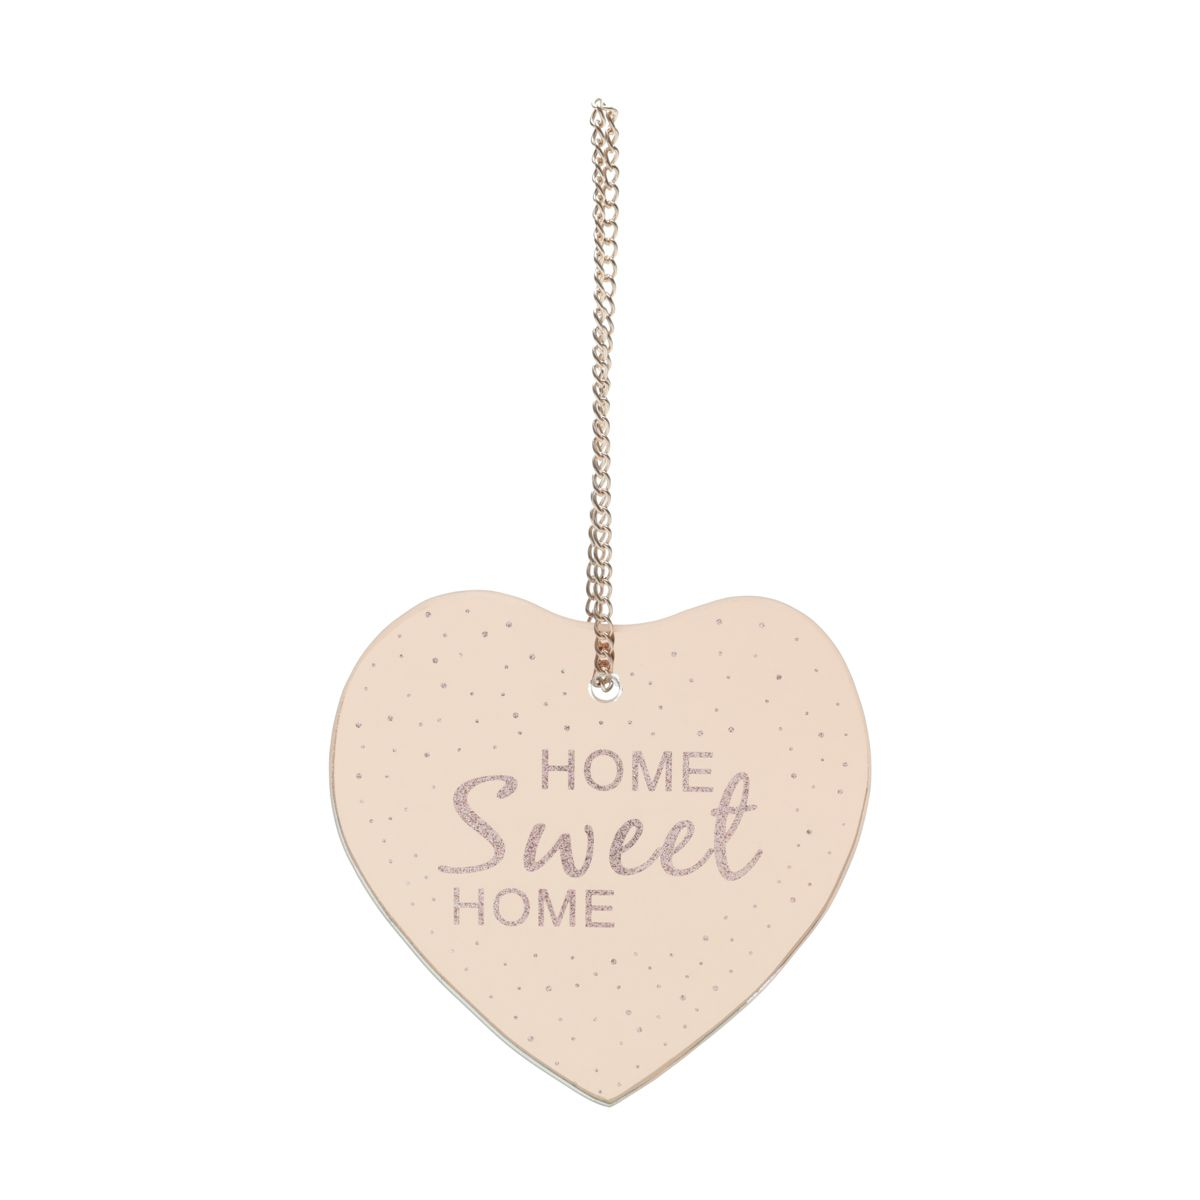 PLACA METAL MIRROR HEART SHAPE HOME COBRE 12X12,5 CM - URBAN 42572